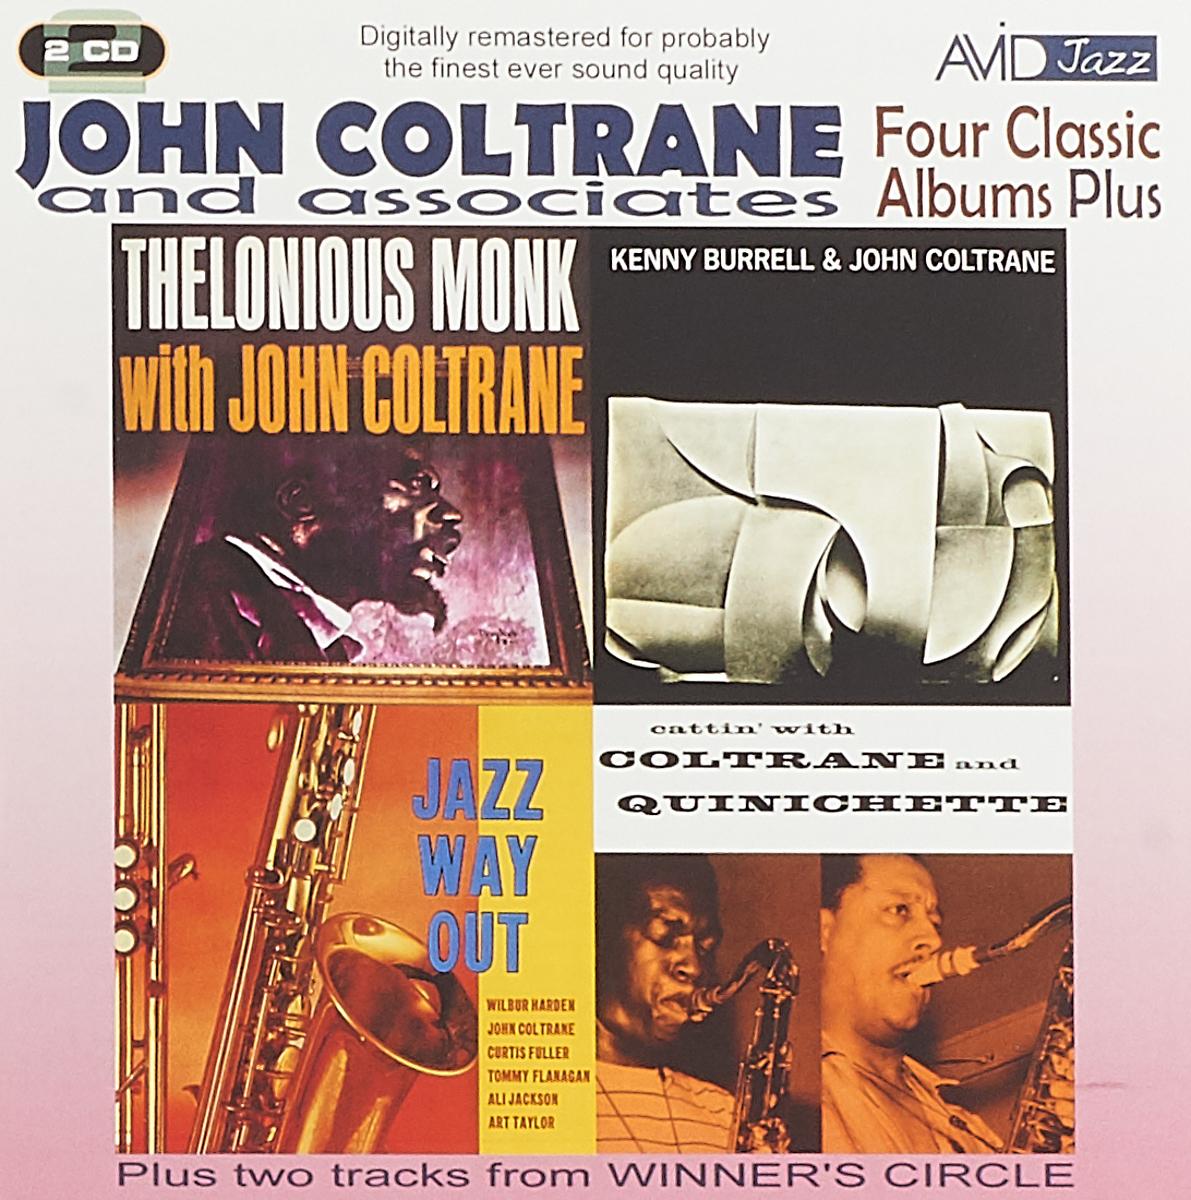 Джон Колтрейн John Coltrane. Four Classic Albums Plus (2 CD) джон колтрейн john coltrane giant steps the best of the early years 10 cd